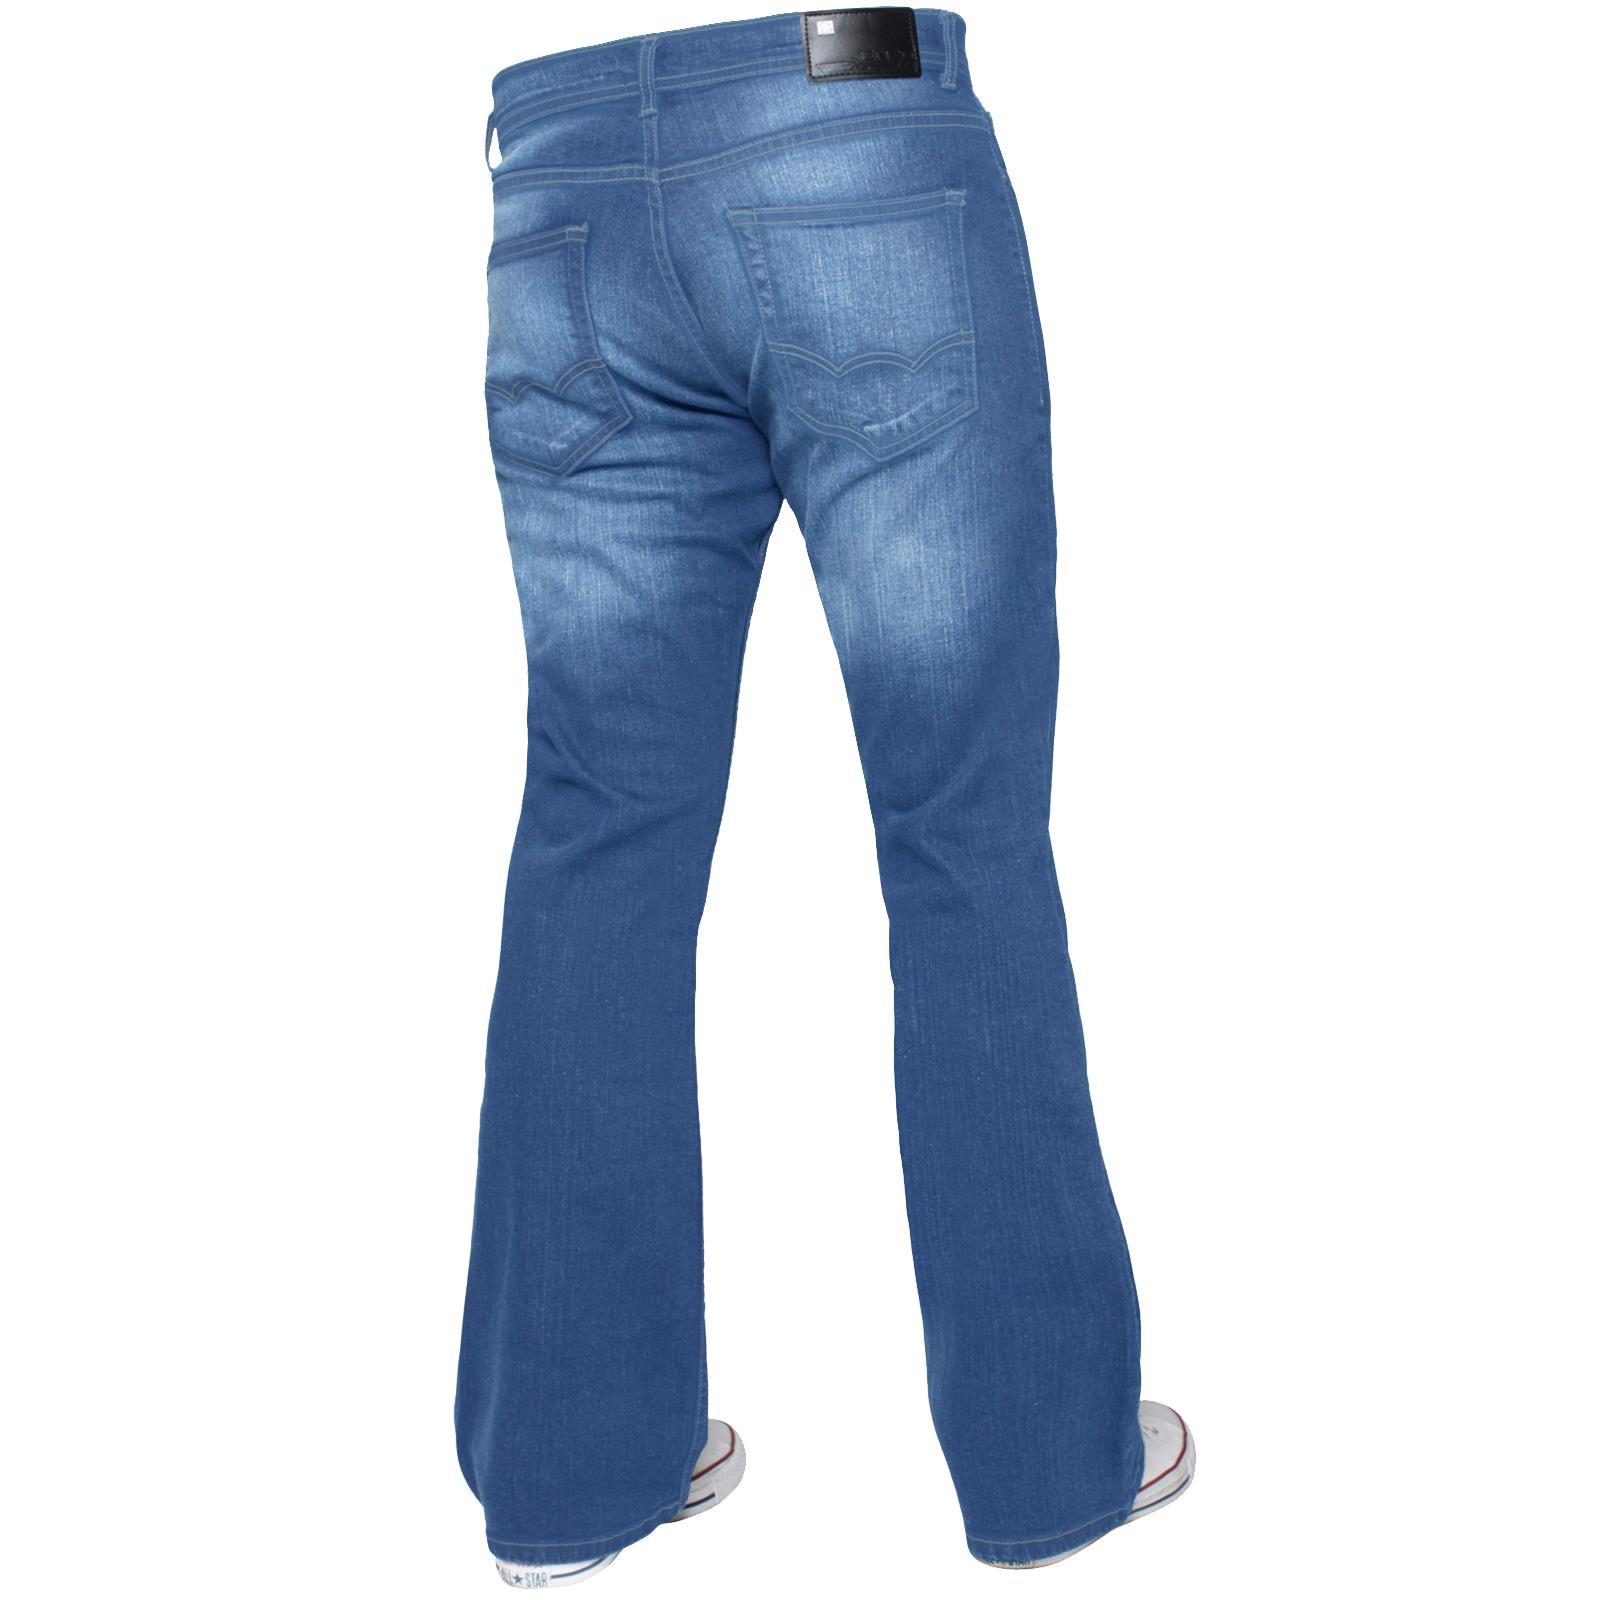 Para-Hombre-Recto-Bootcut-Stretch-Jeans-Pantalones-Regular-Fit-Grande-Alto-Todas-Cinturas miniatura 42